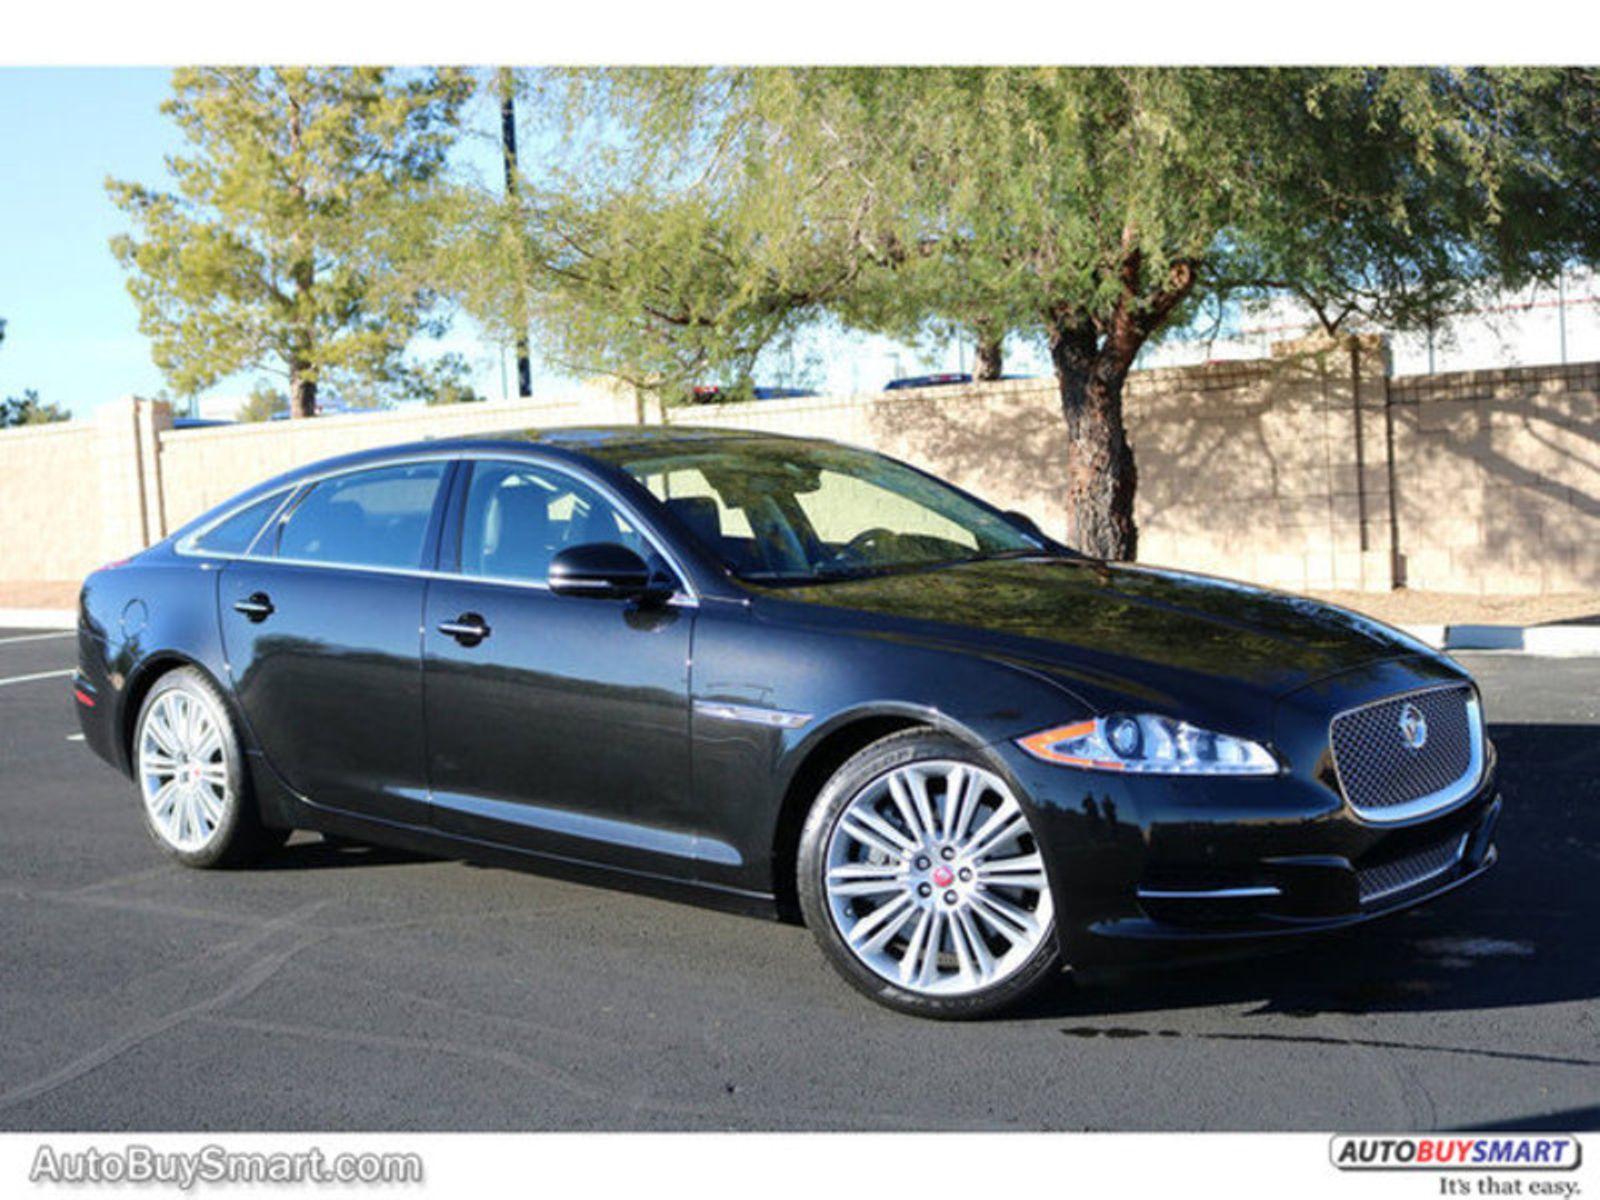 2015 Jaguar XJL Supercharged RWD In Las Vegas, NV ...